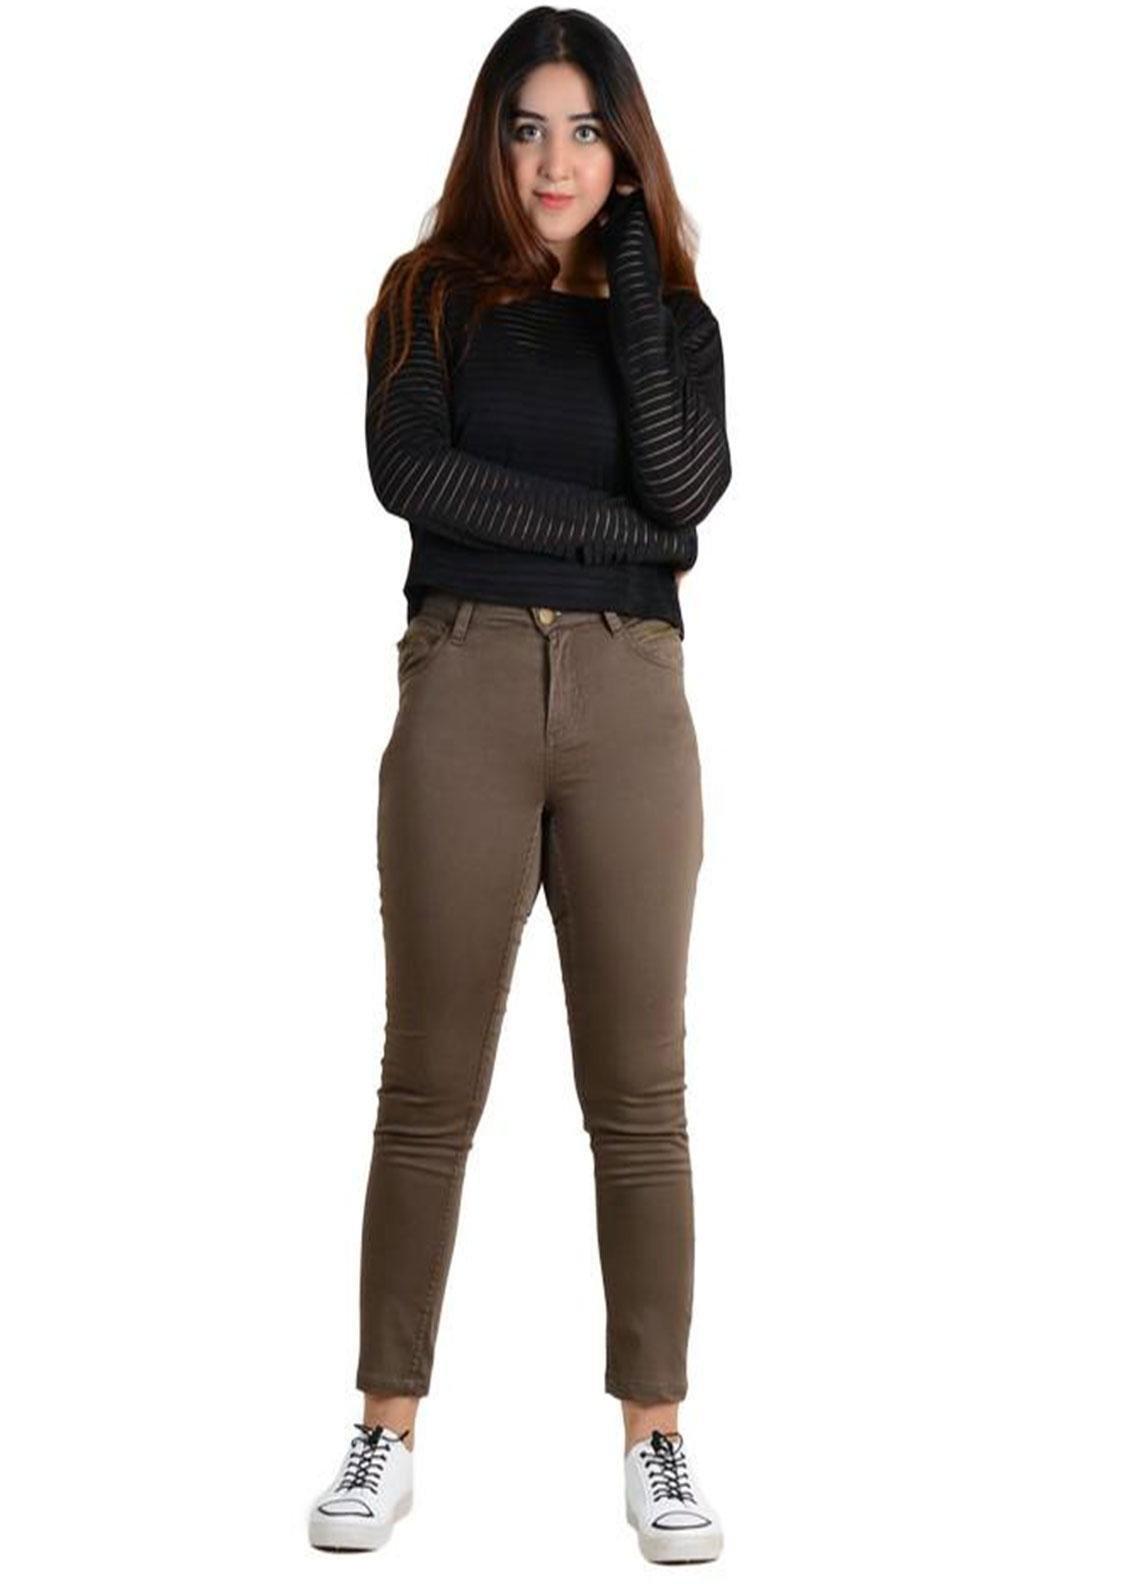 Ignite Wardrobe Stretchable Cotton Pants IG20PNW 011